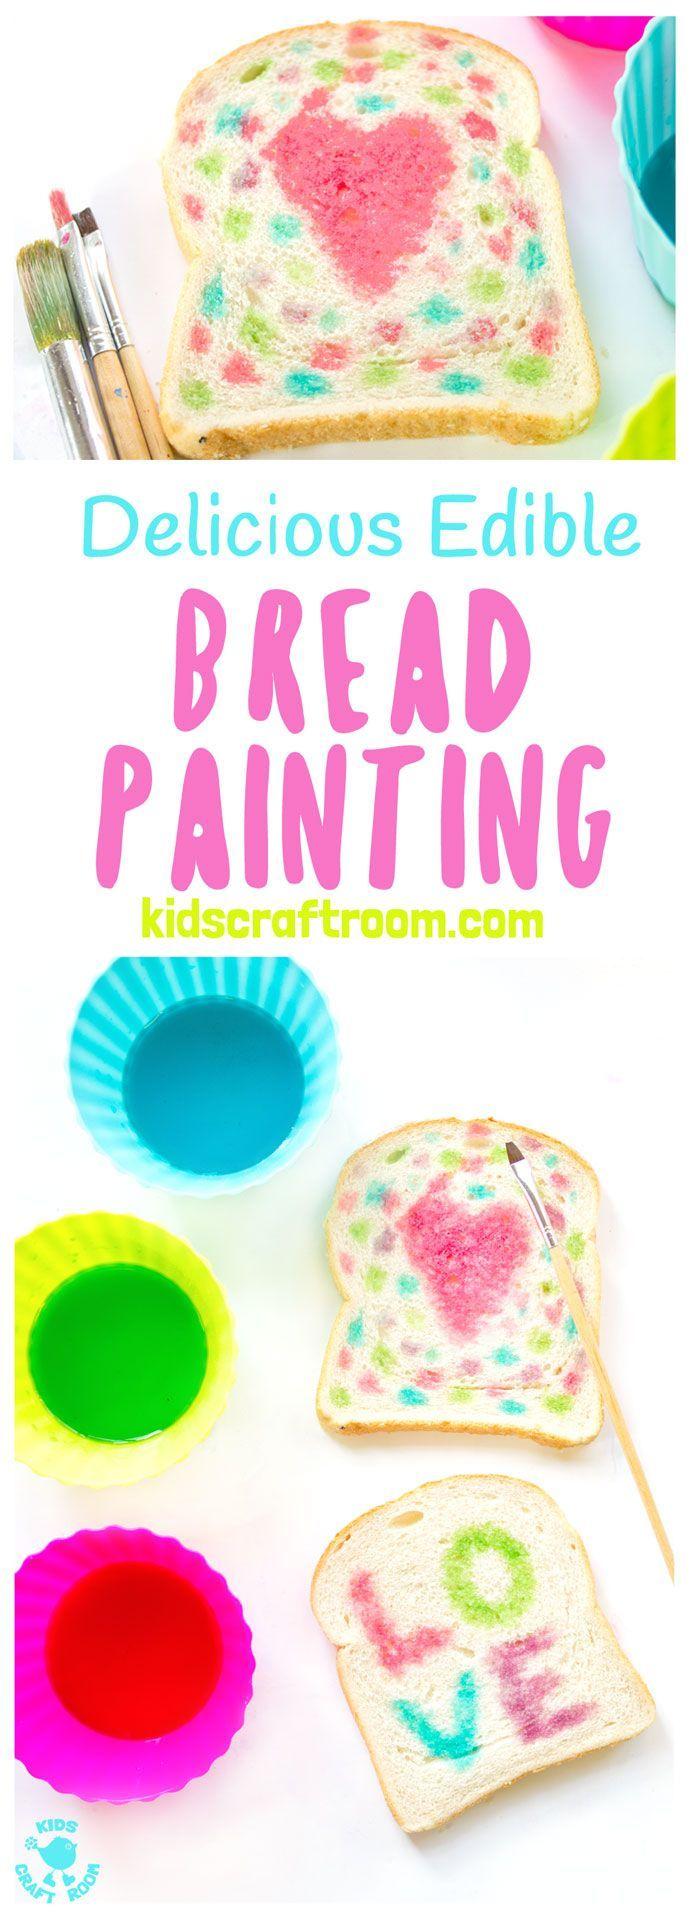 delicious edible bread painting